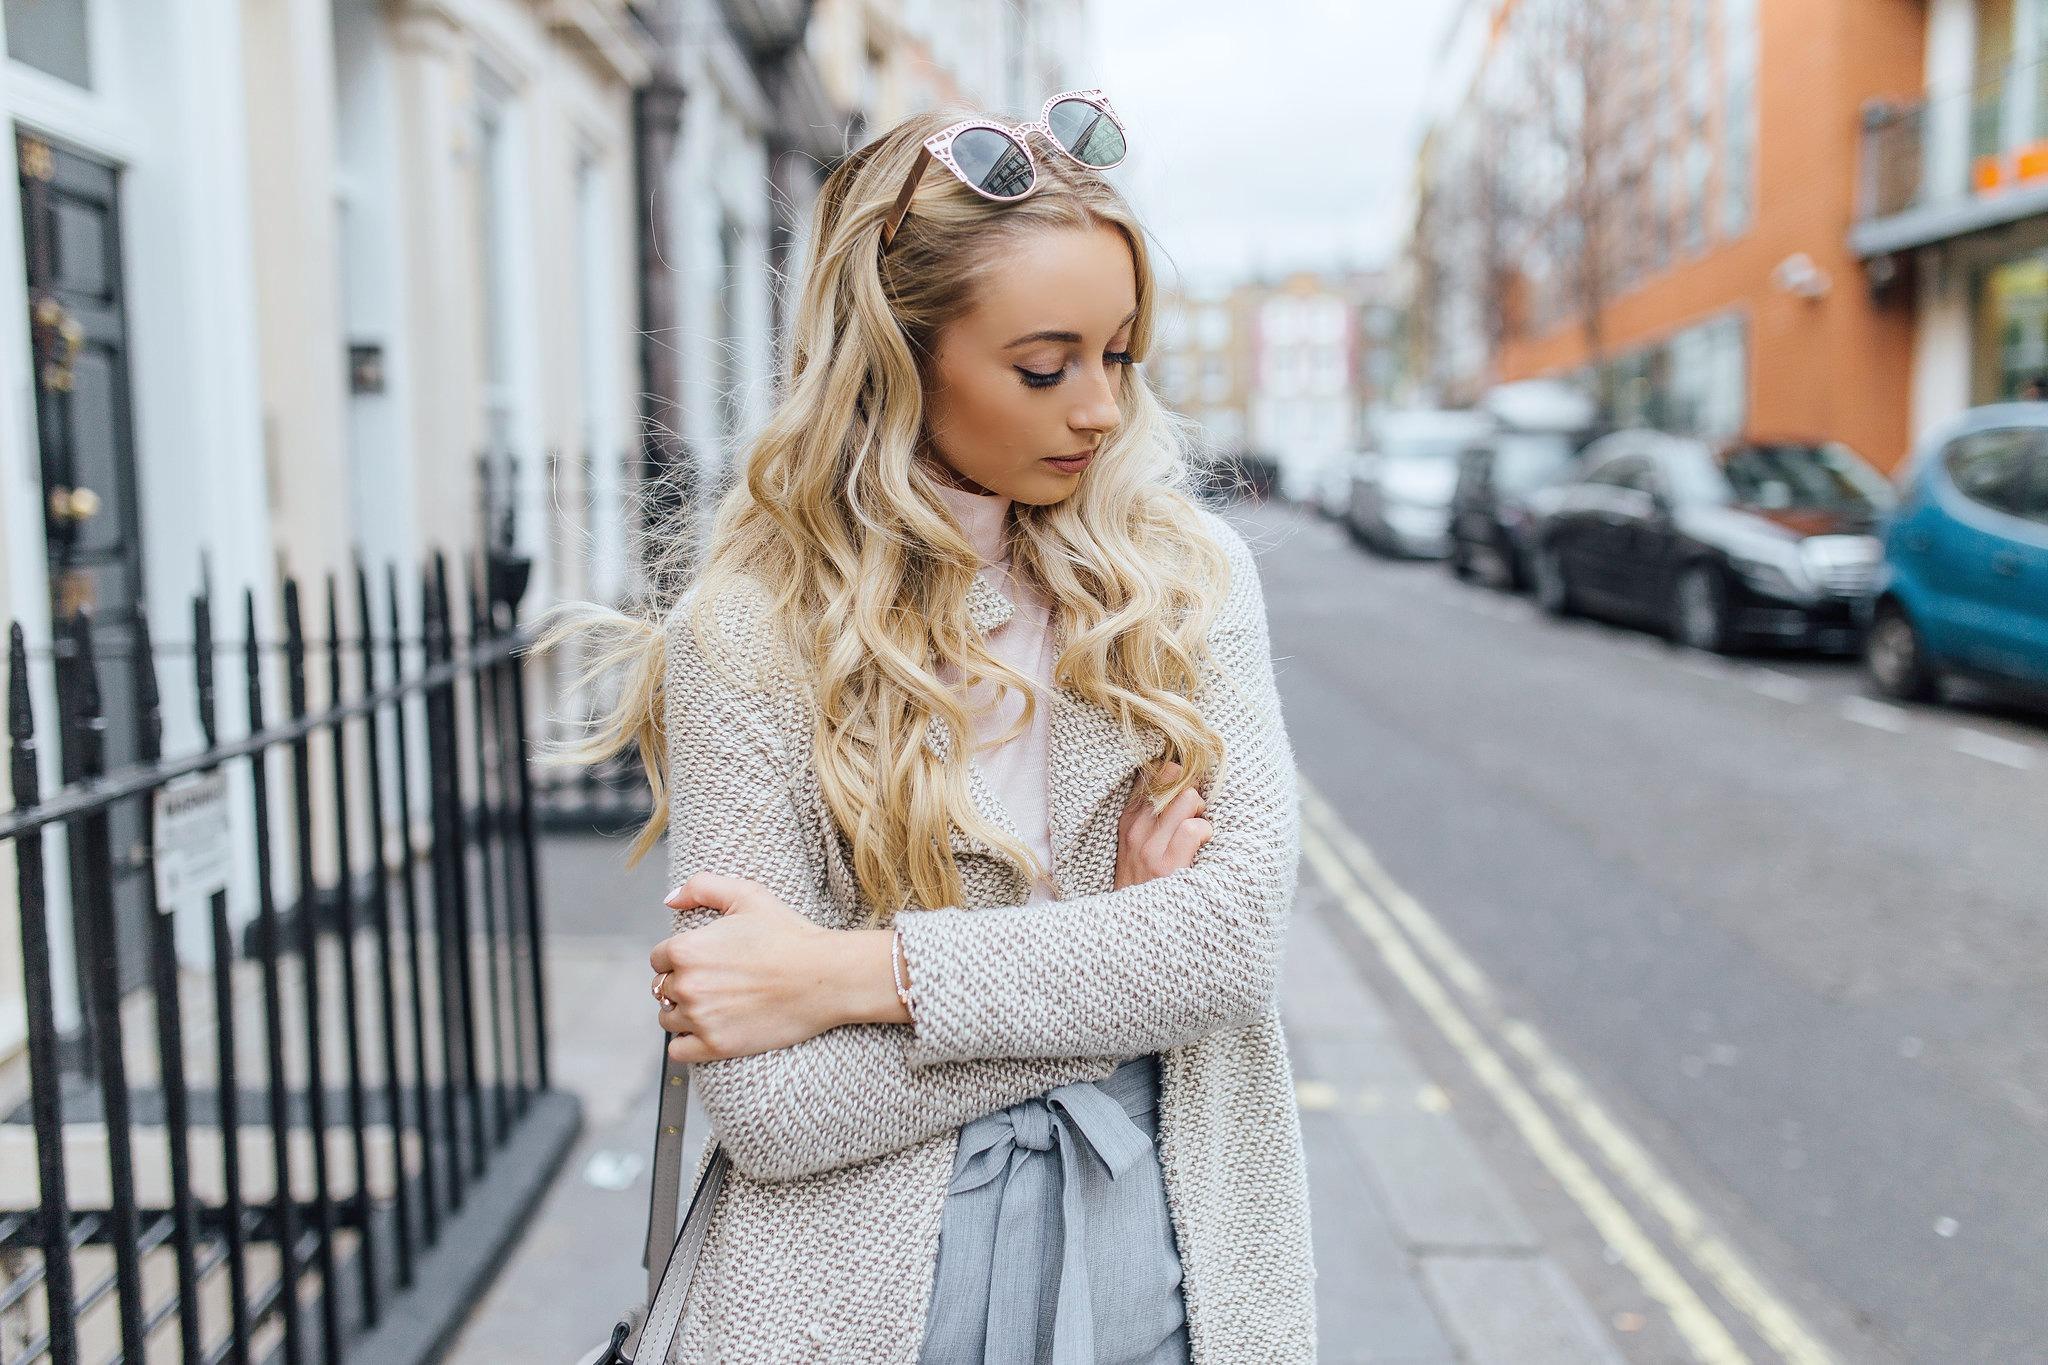 ... London Fashion Week Day One #ootd fashion mumblr 1 ...